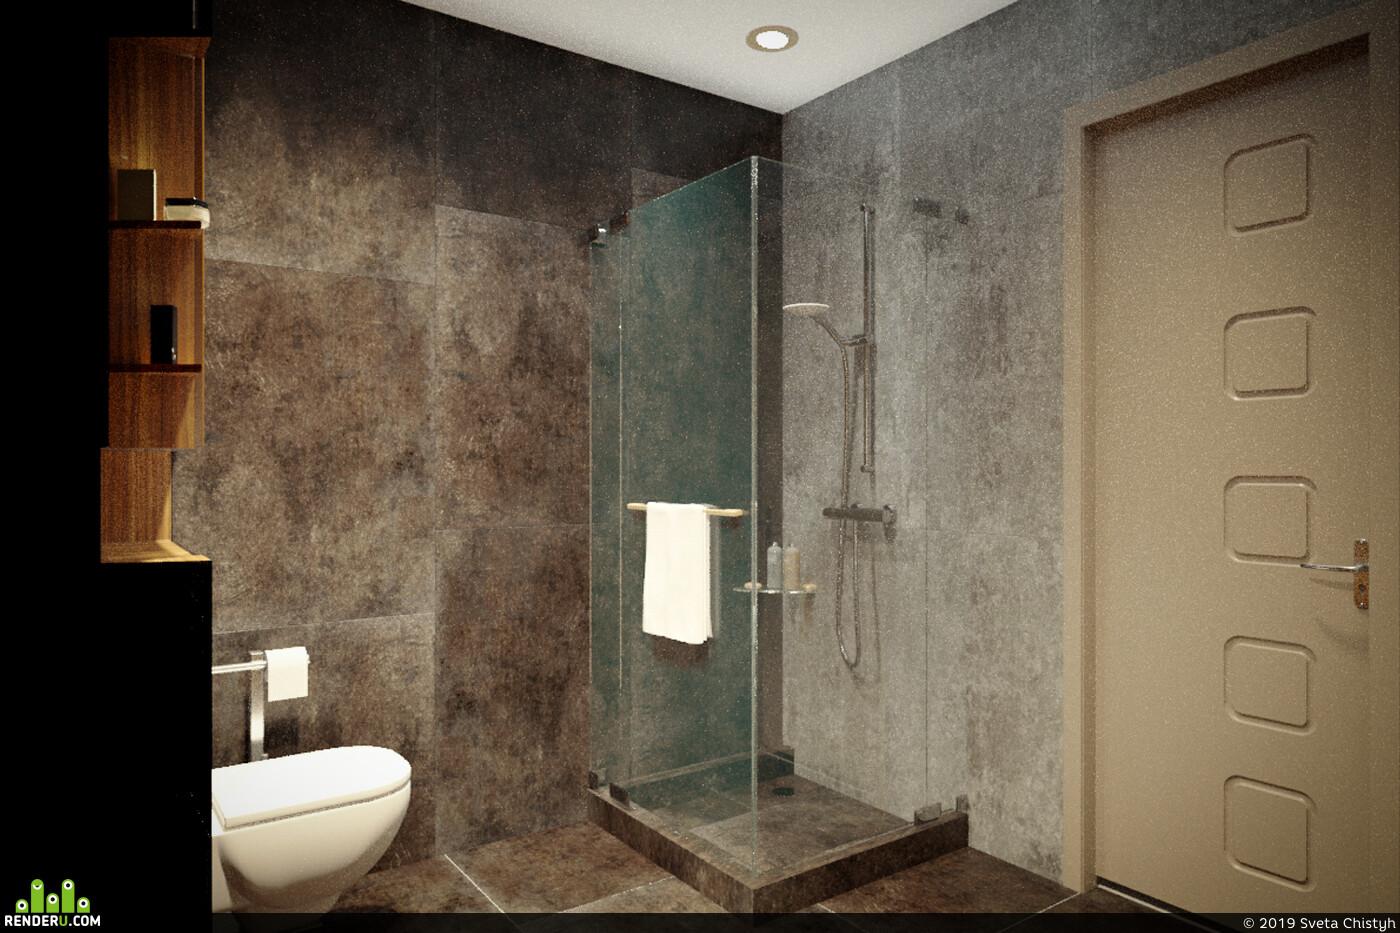 санузел, душевая кабина, Туалет, кафель, темный интерьер, коричневый